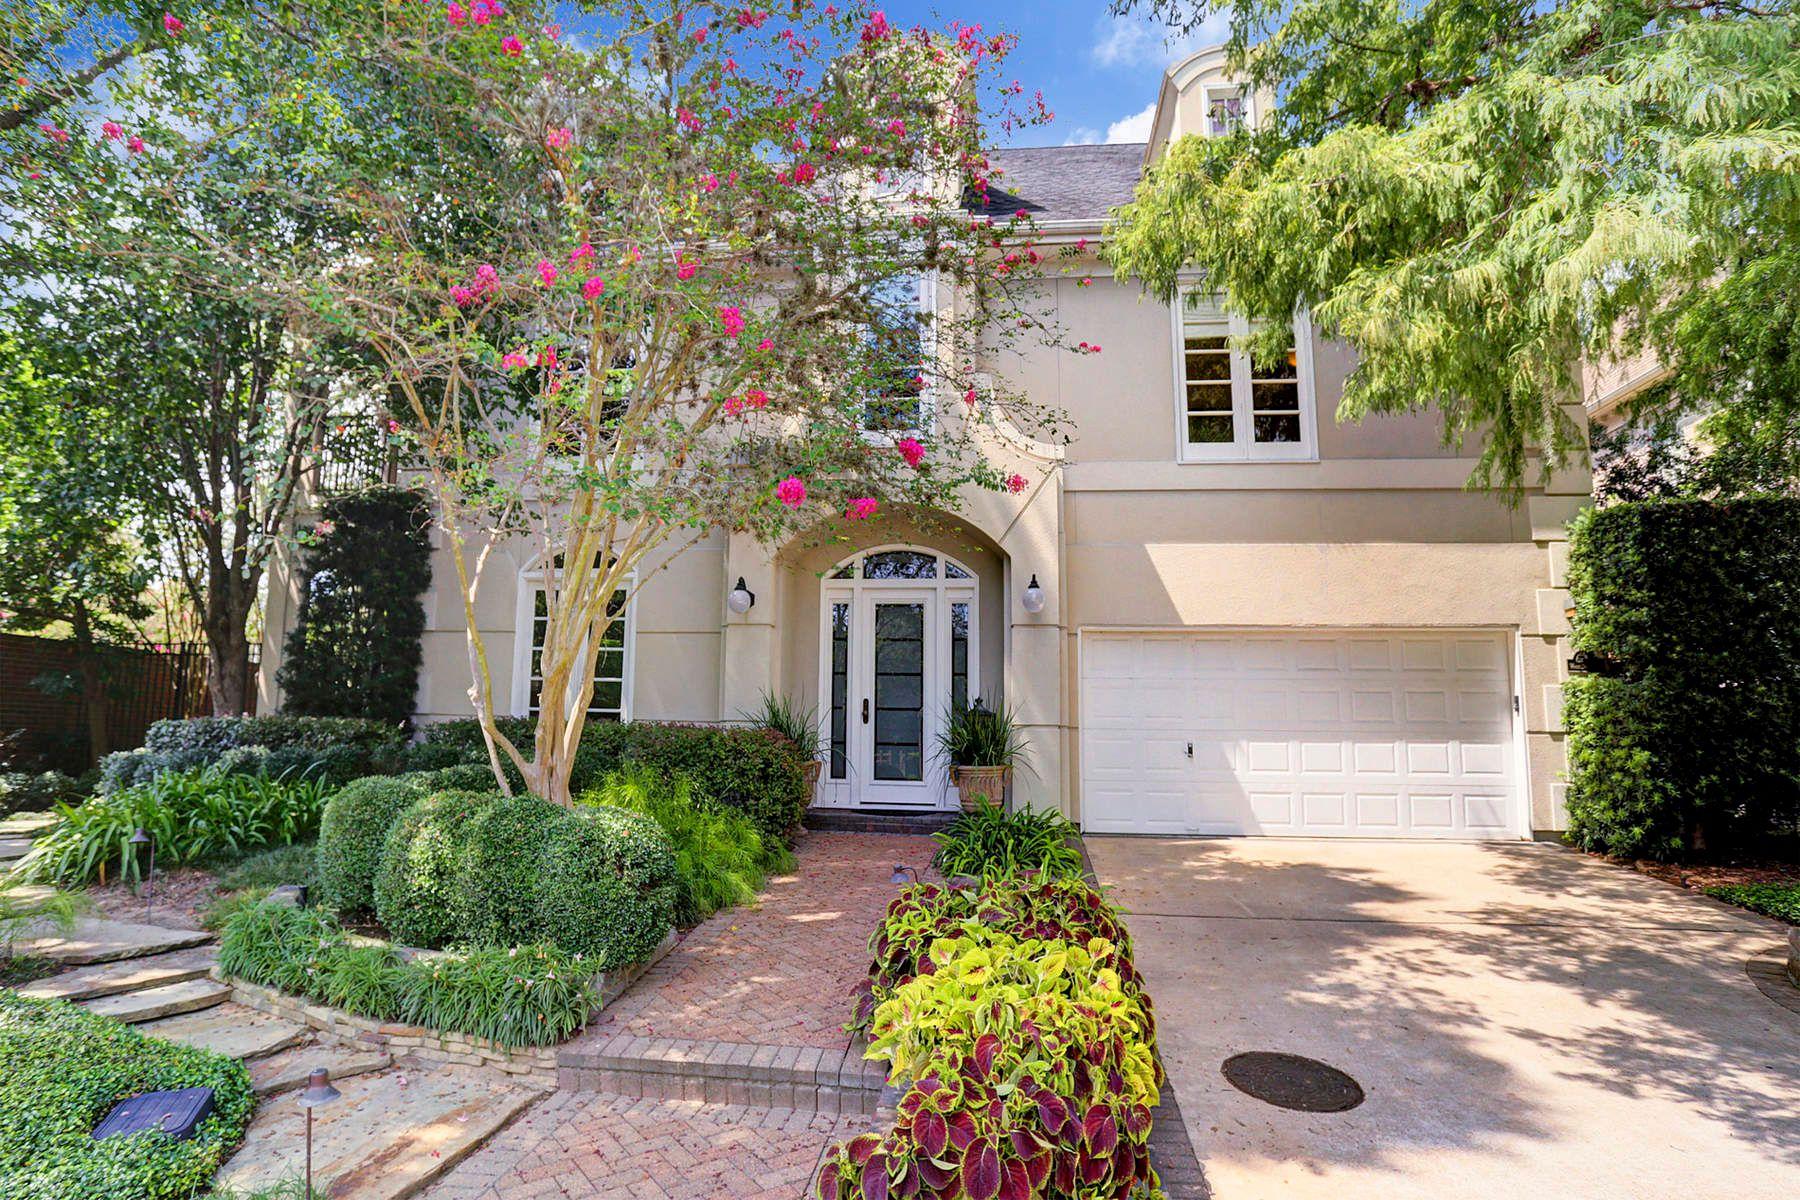 Single Family Home for Sale at 6266 Woods Bridge Way 6266 Wood Bridge Way, Houston, Texas, 77007 United States